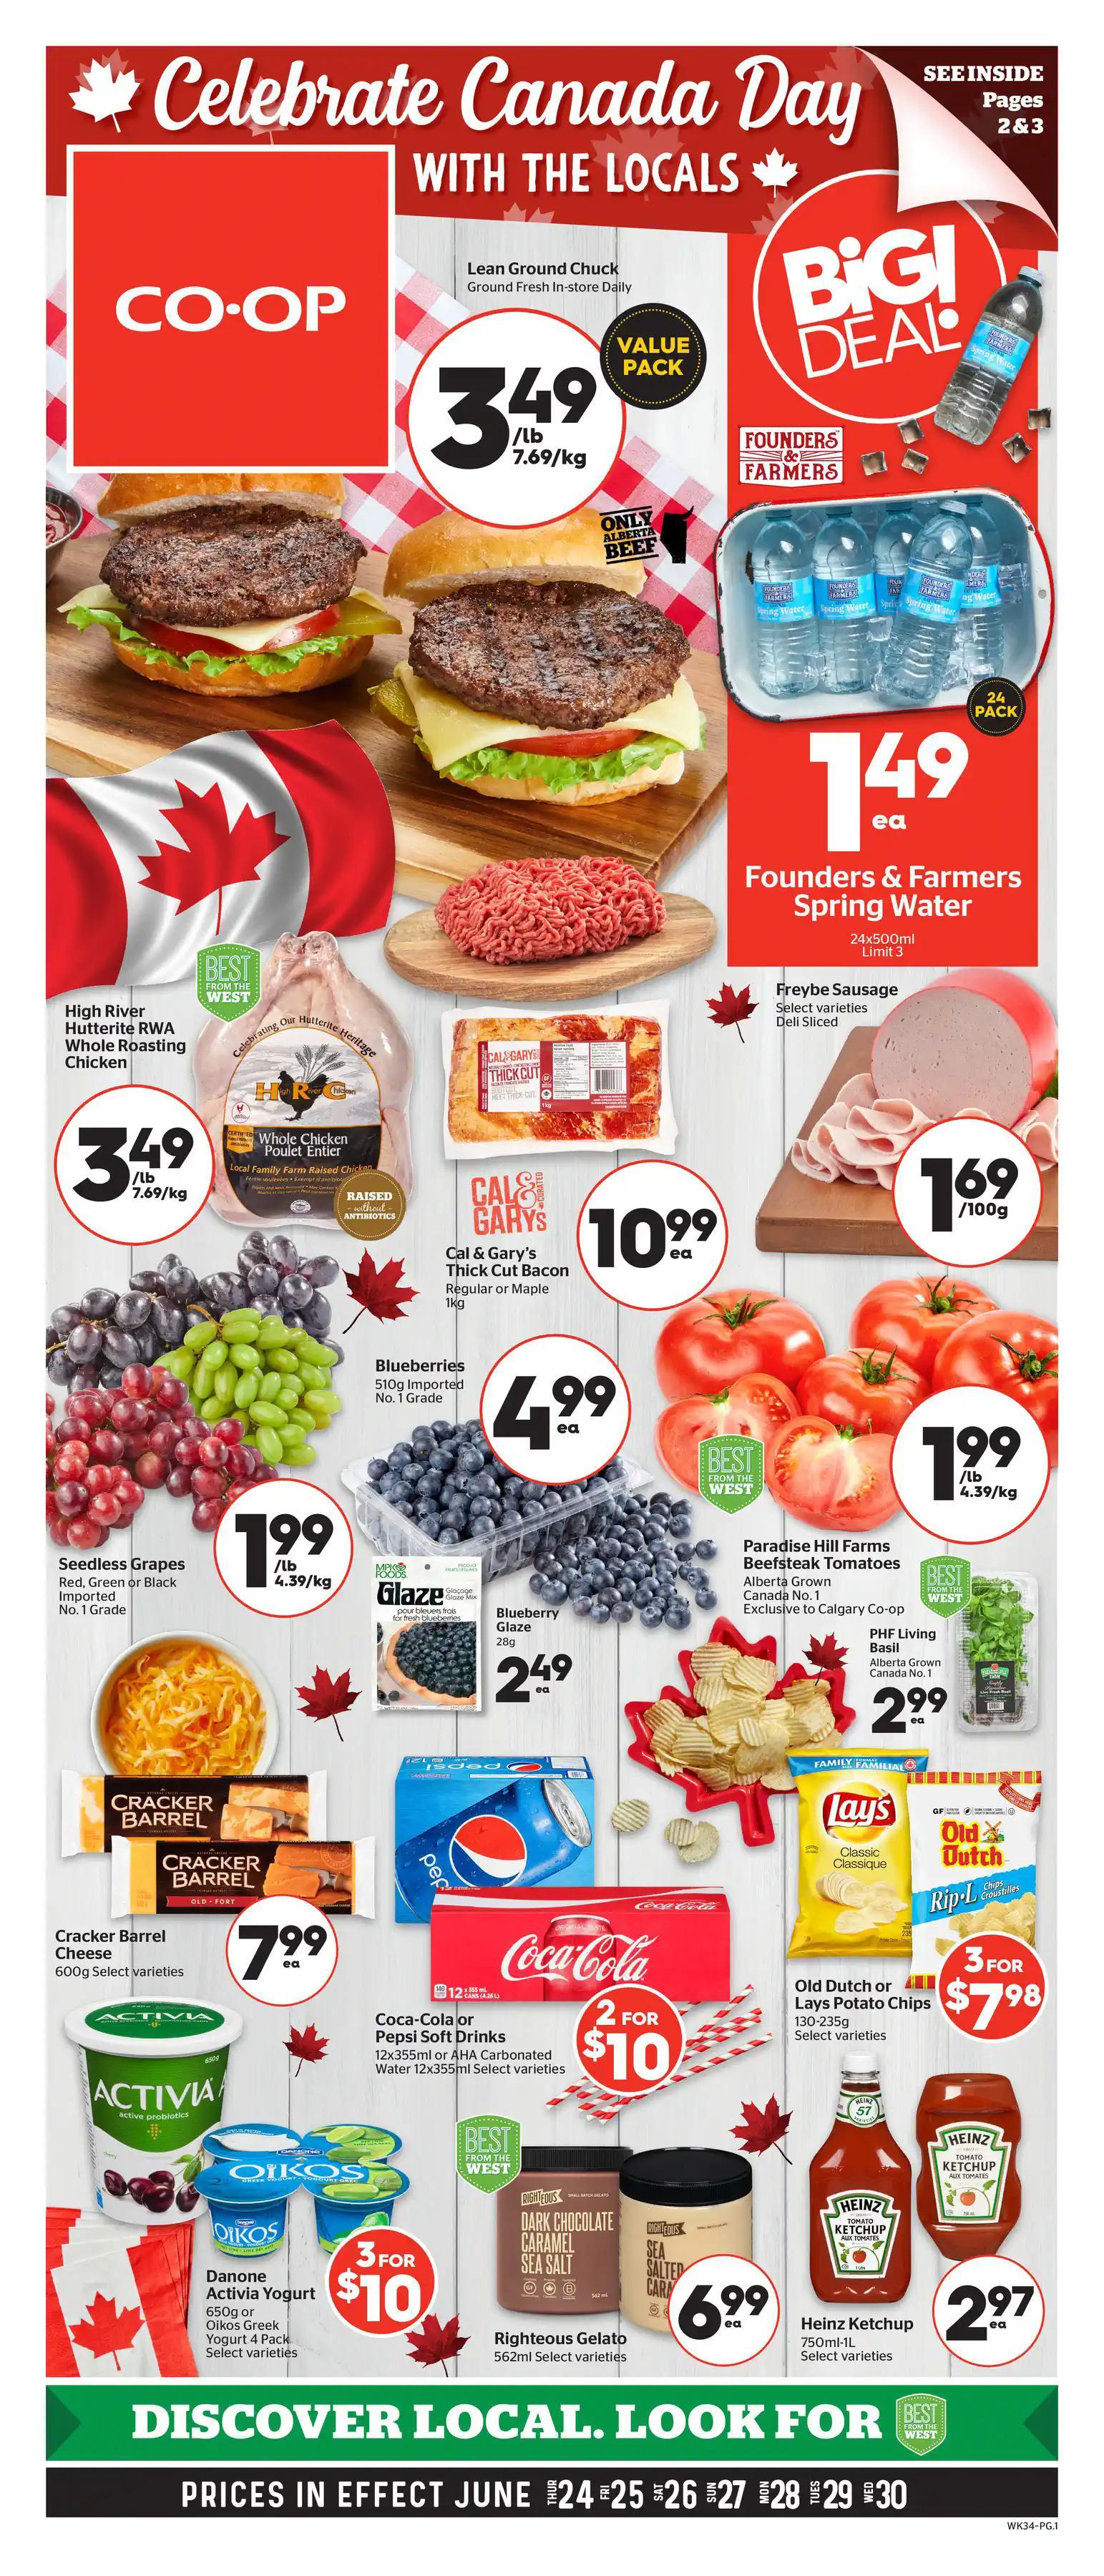 Calgary Co-op - Weekly Flyer Specials